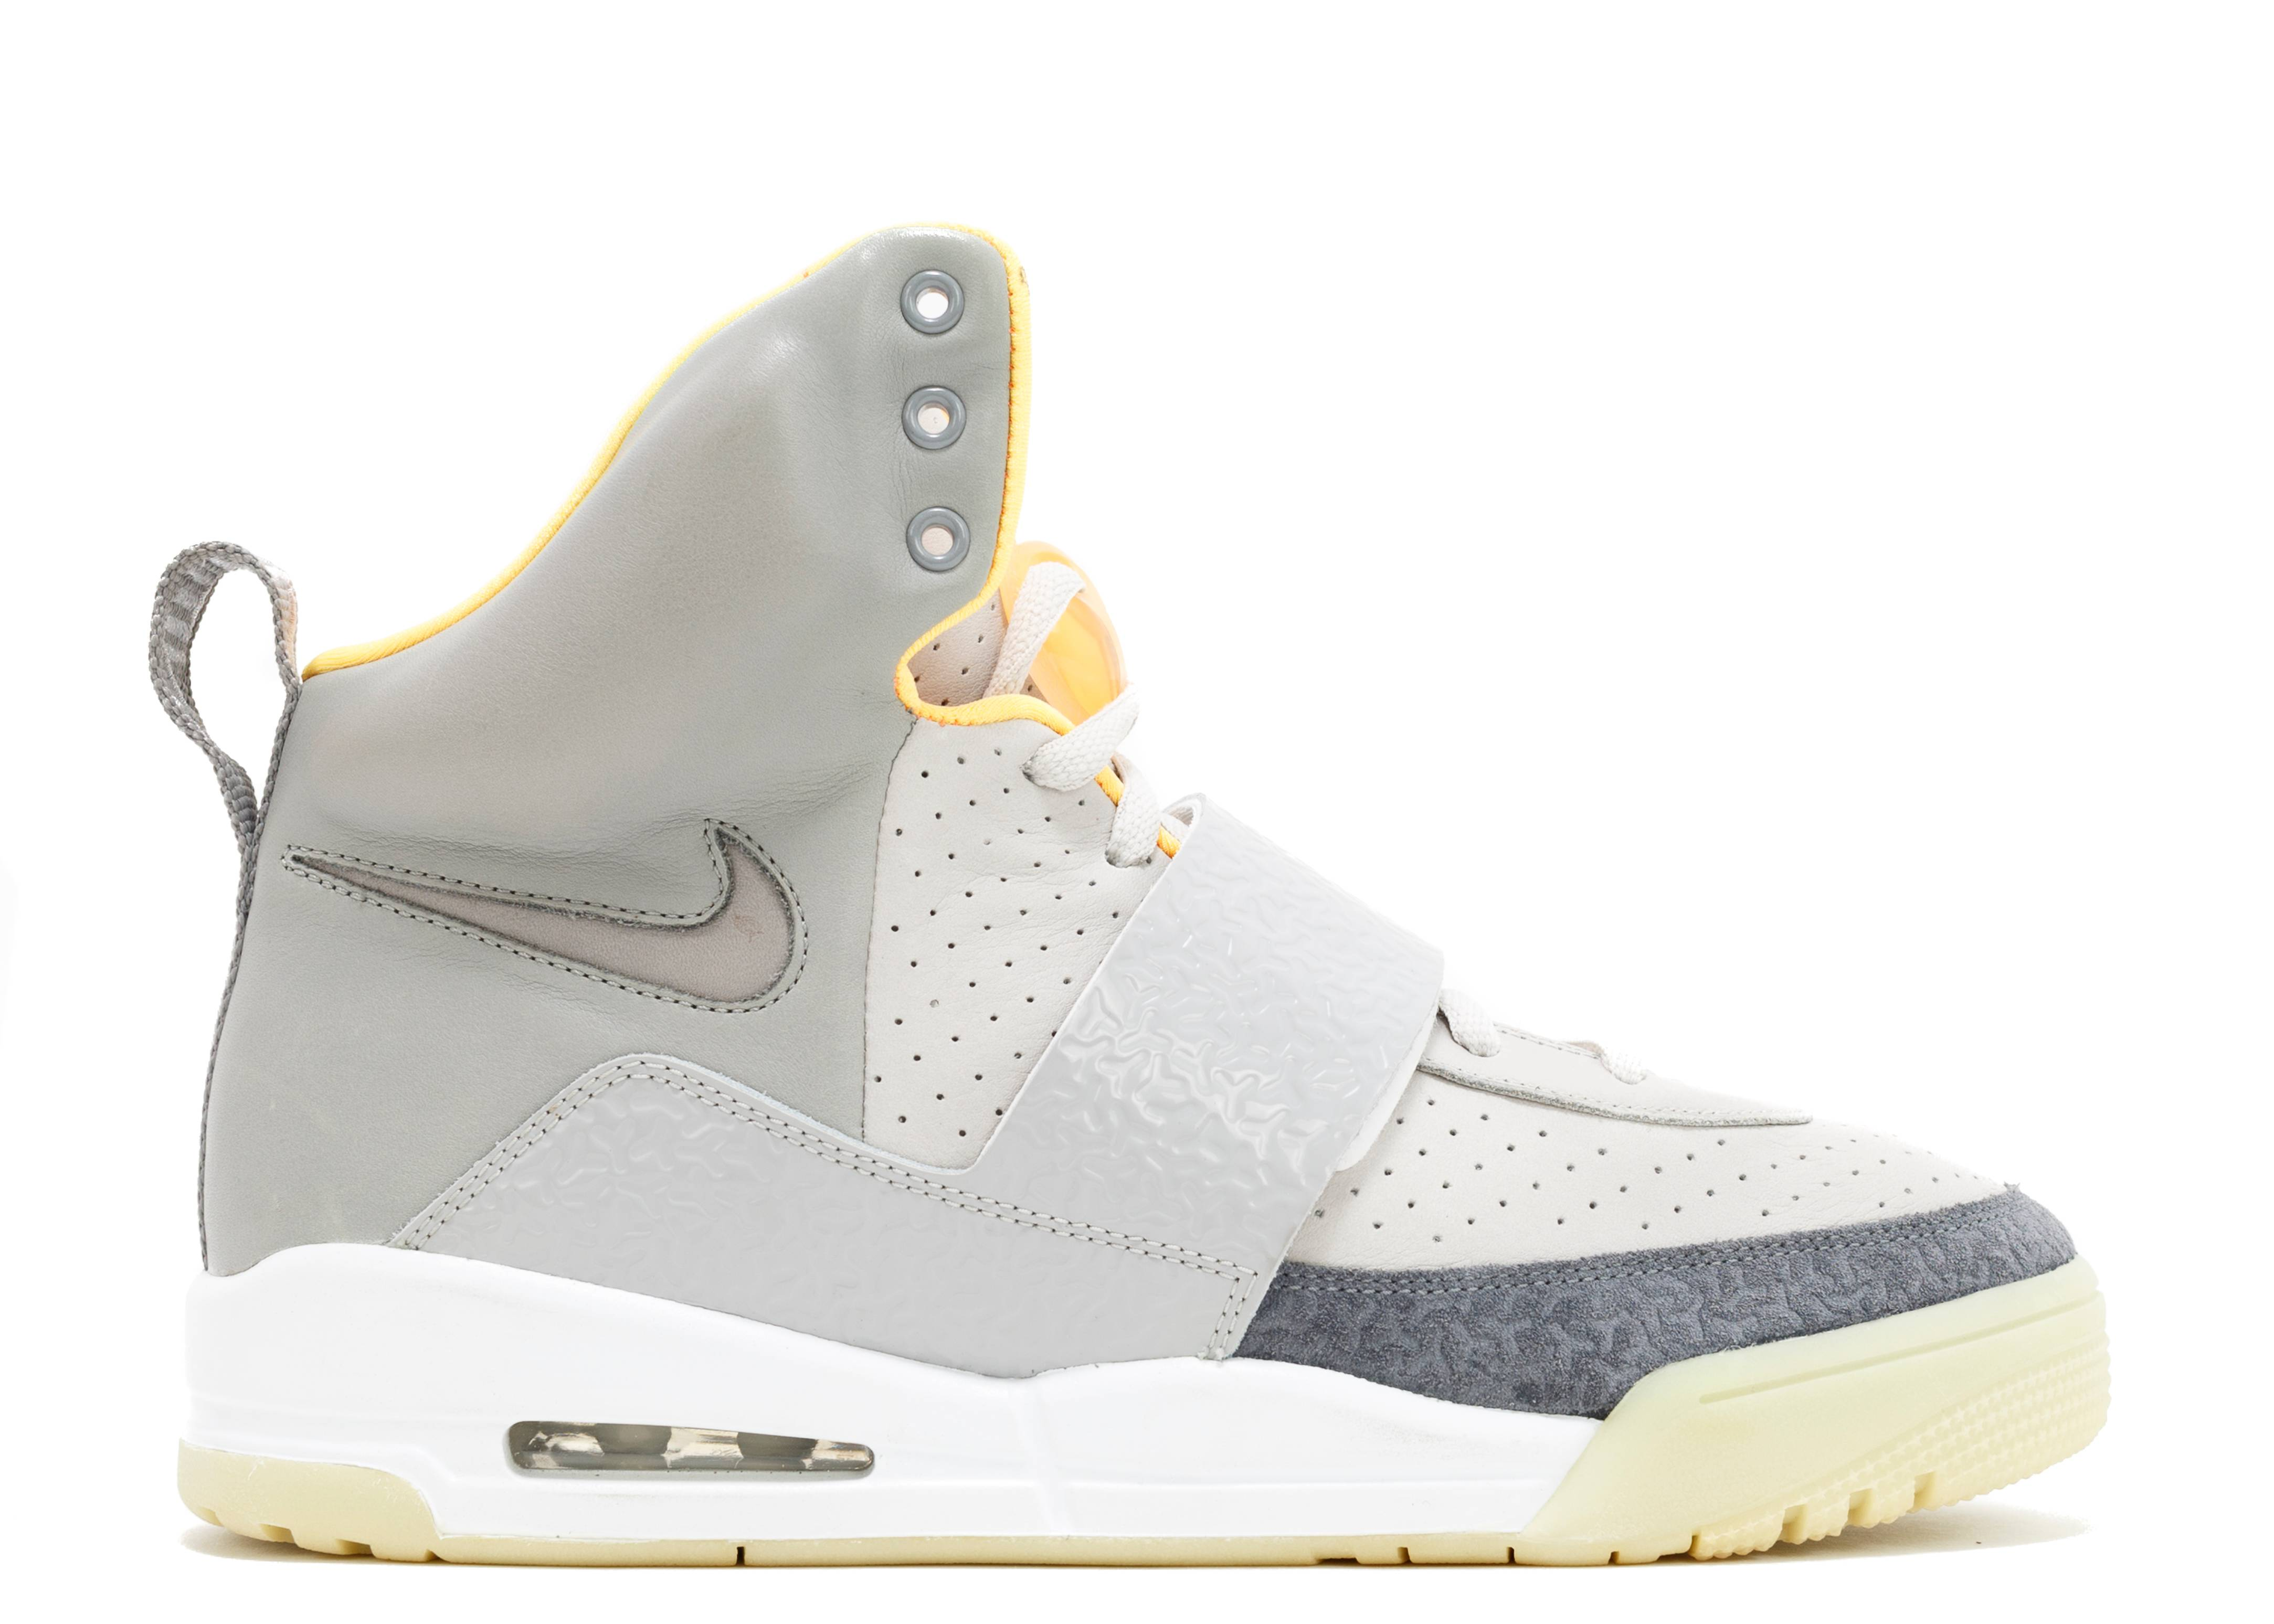 83be37b311b3d Nike Air Huarache Cool Grey